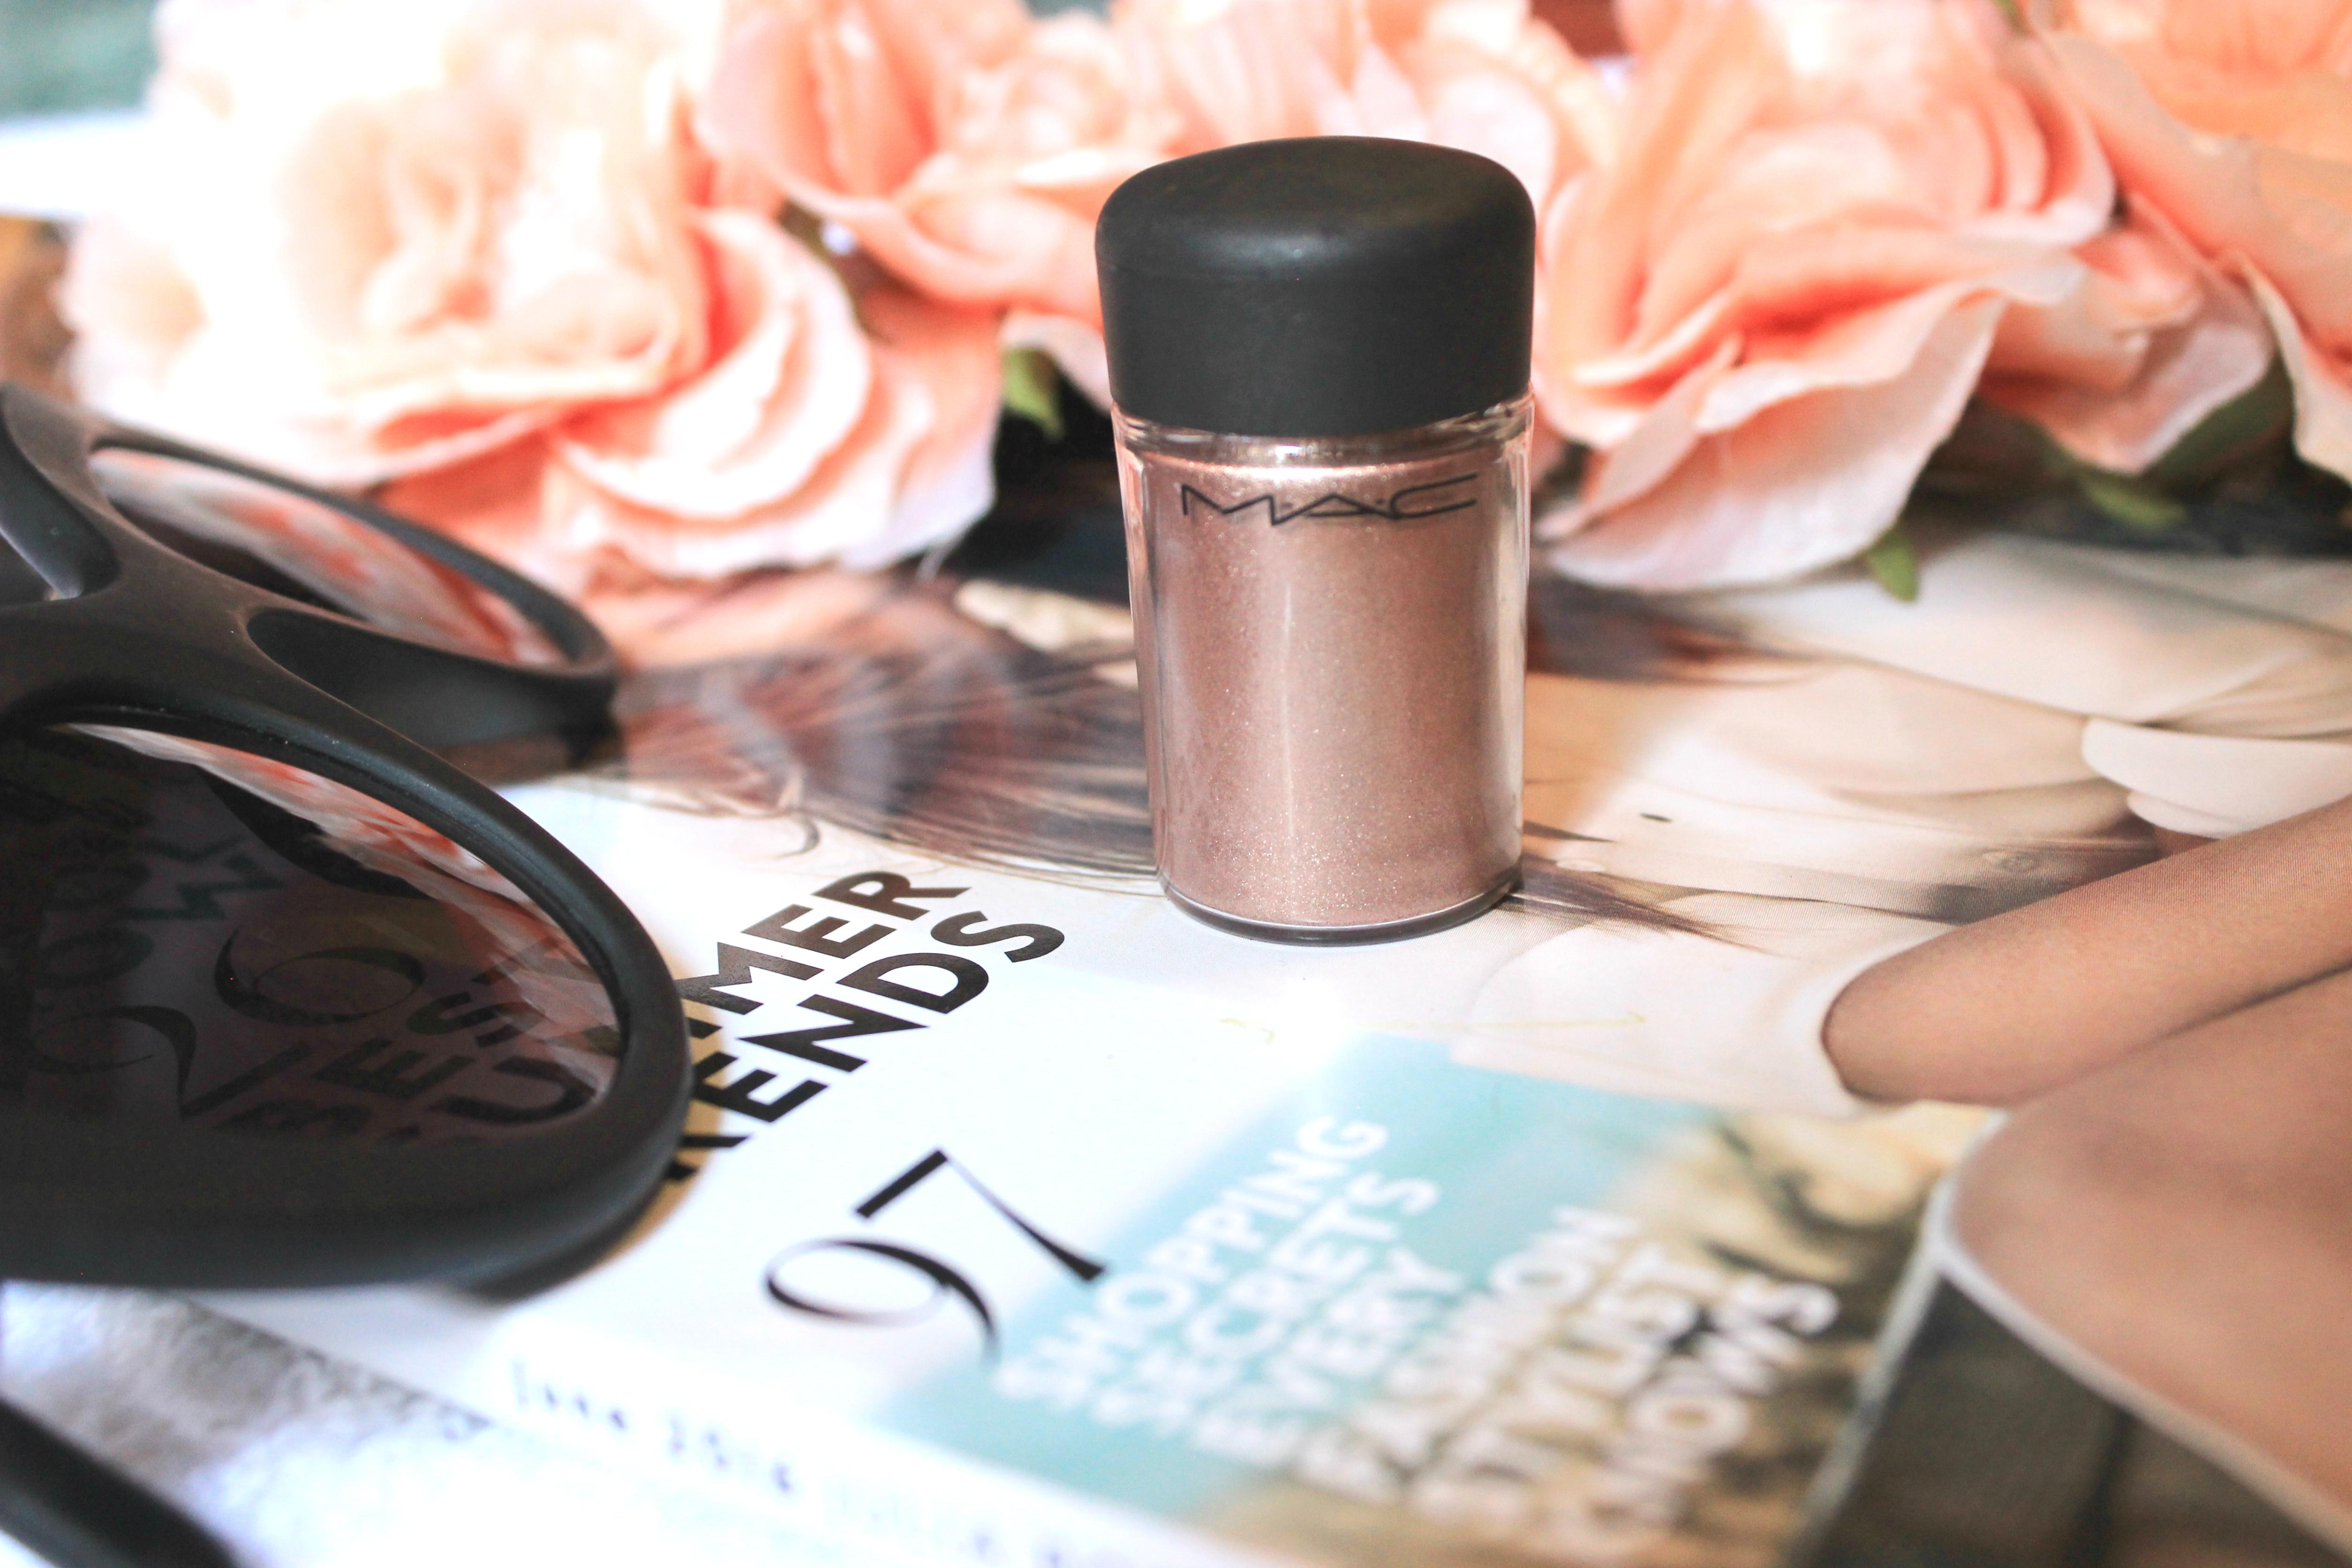 MAC-Cosmetics-Prolong-wear-concealer-Studio-fix-fluid-MAC-Amber-Lights-MAC-Brown-Script-Eye-Shadow-MAC-Pigment-Tan-MAC-Faux-lipstick-Makeup-Mondays-Oohlalablog-21